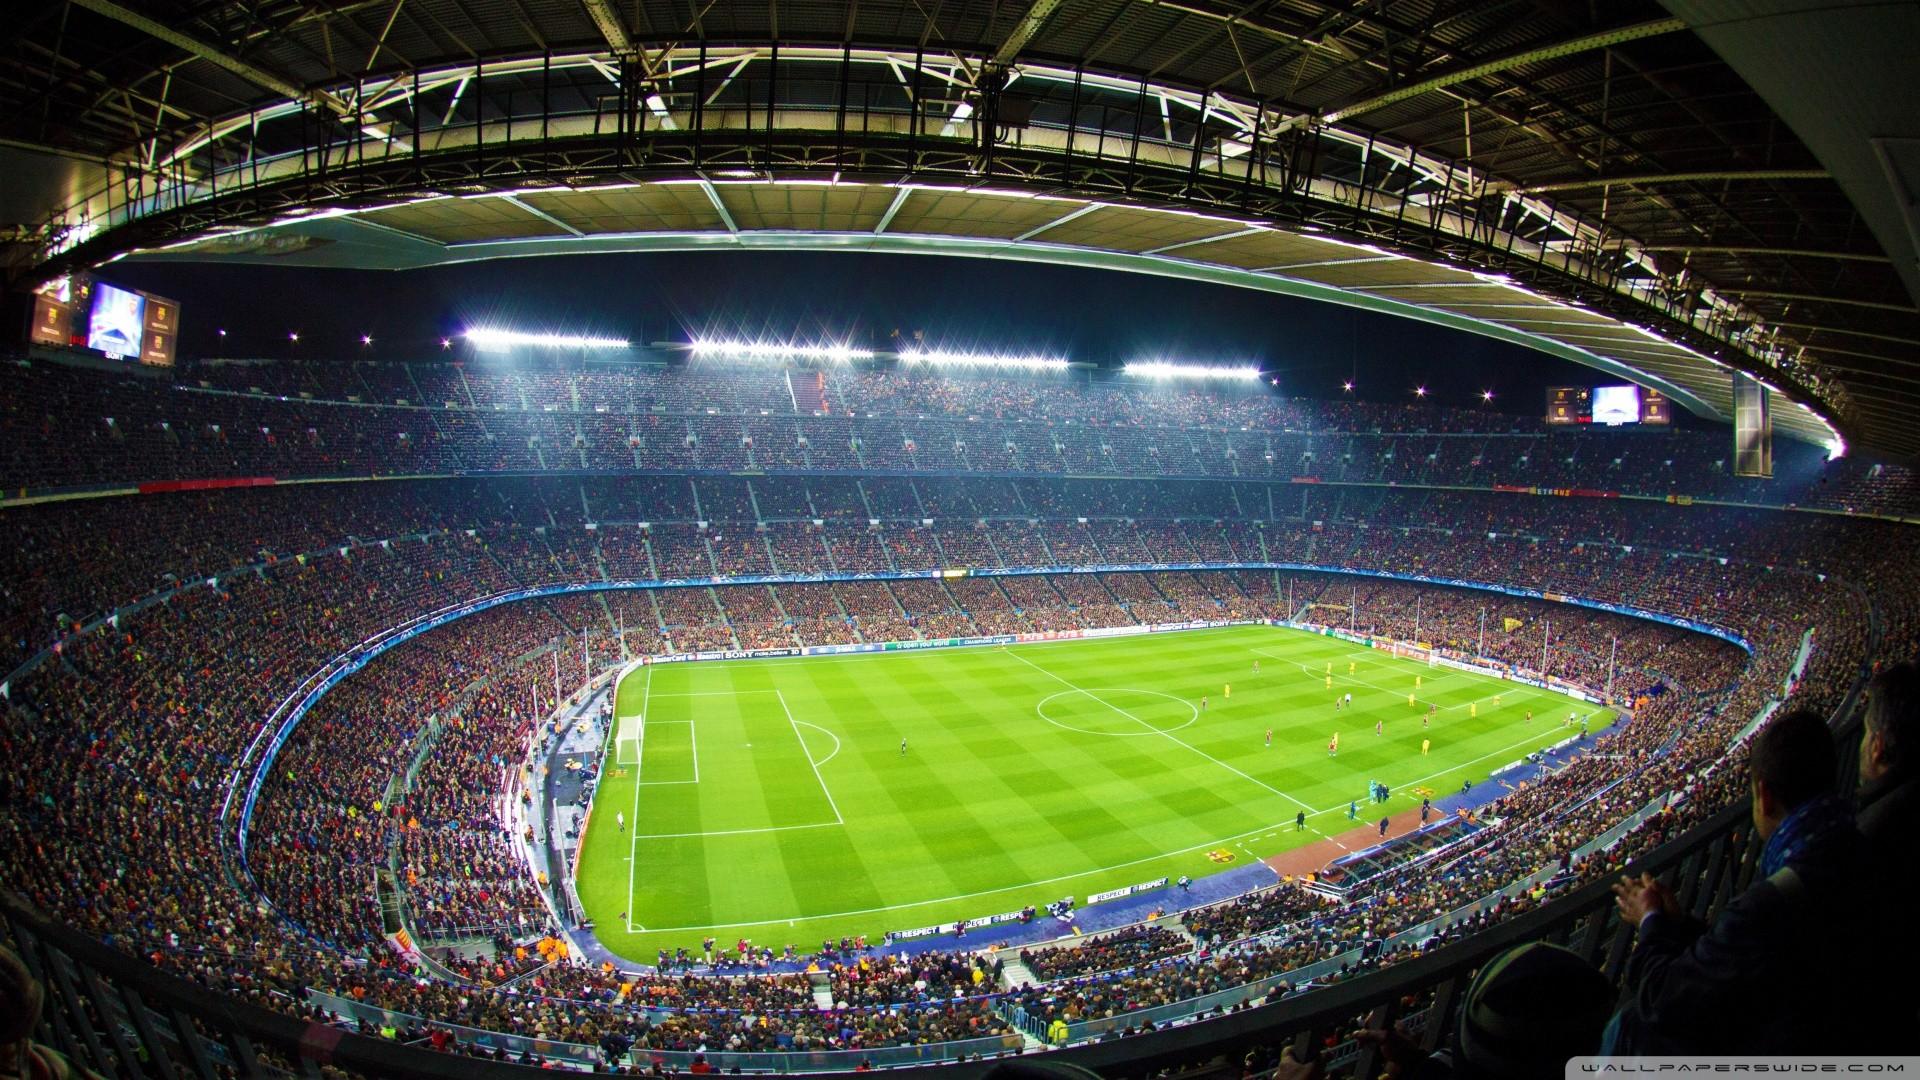 Football stadium background 60 images - Soccer stadium hd ...